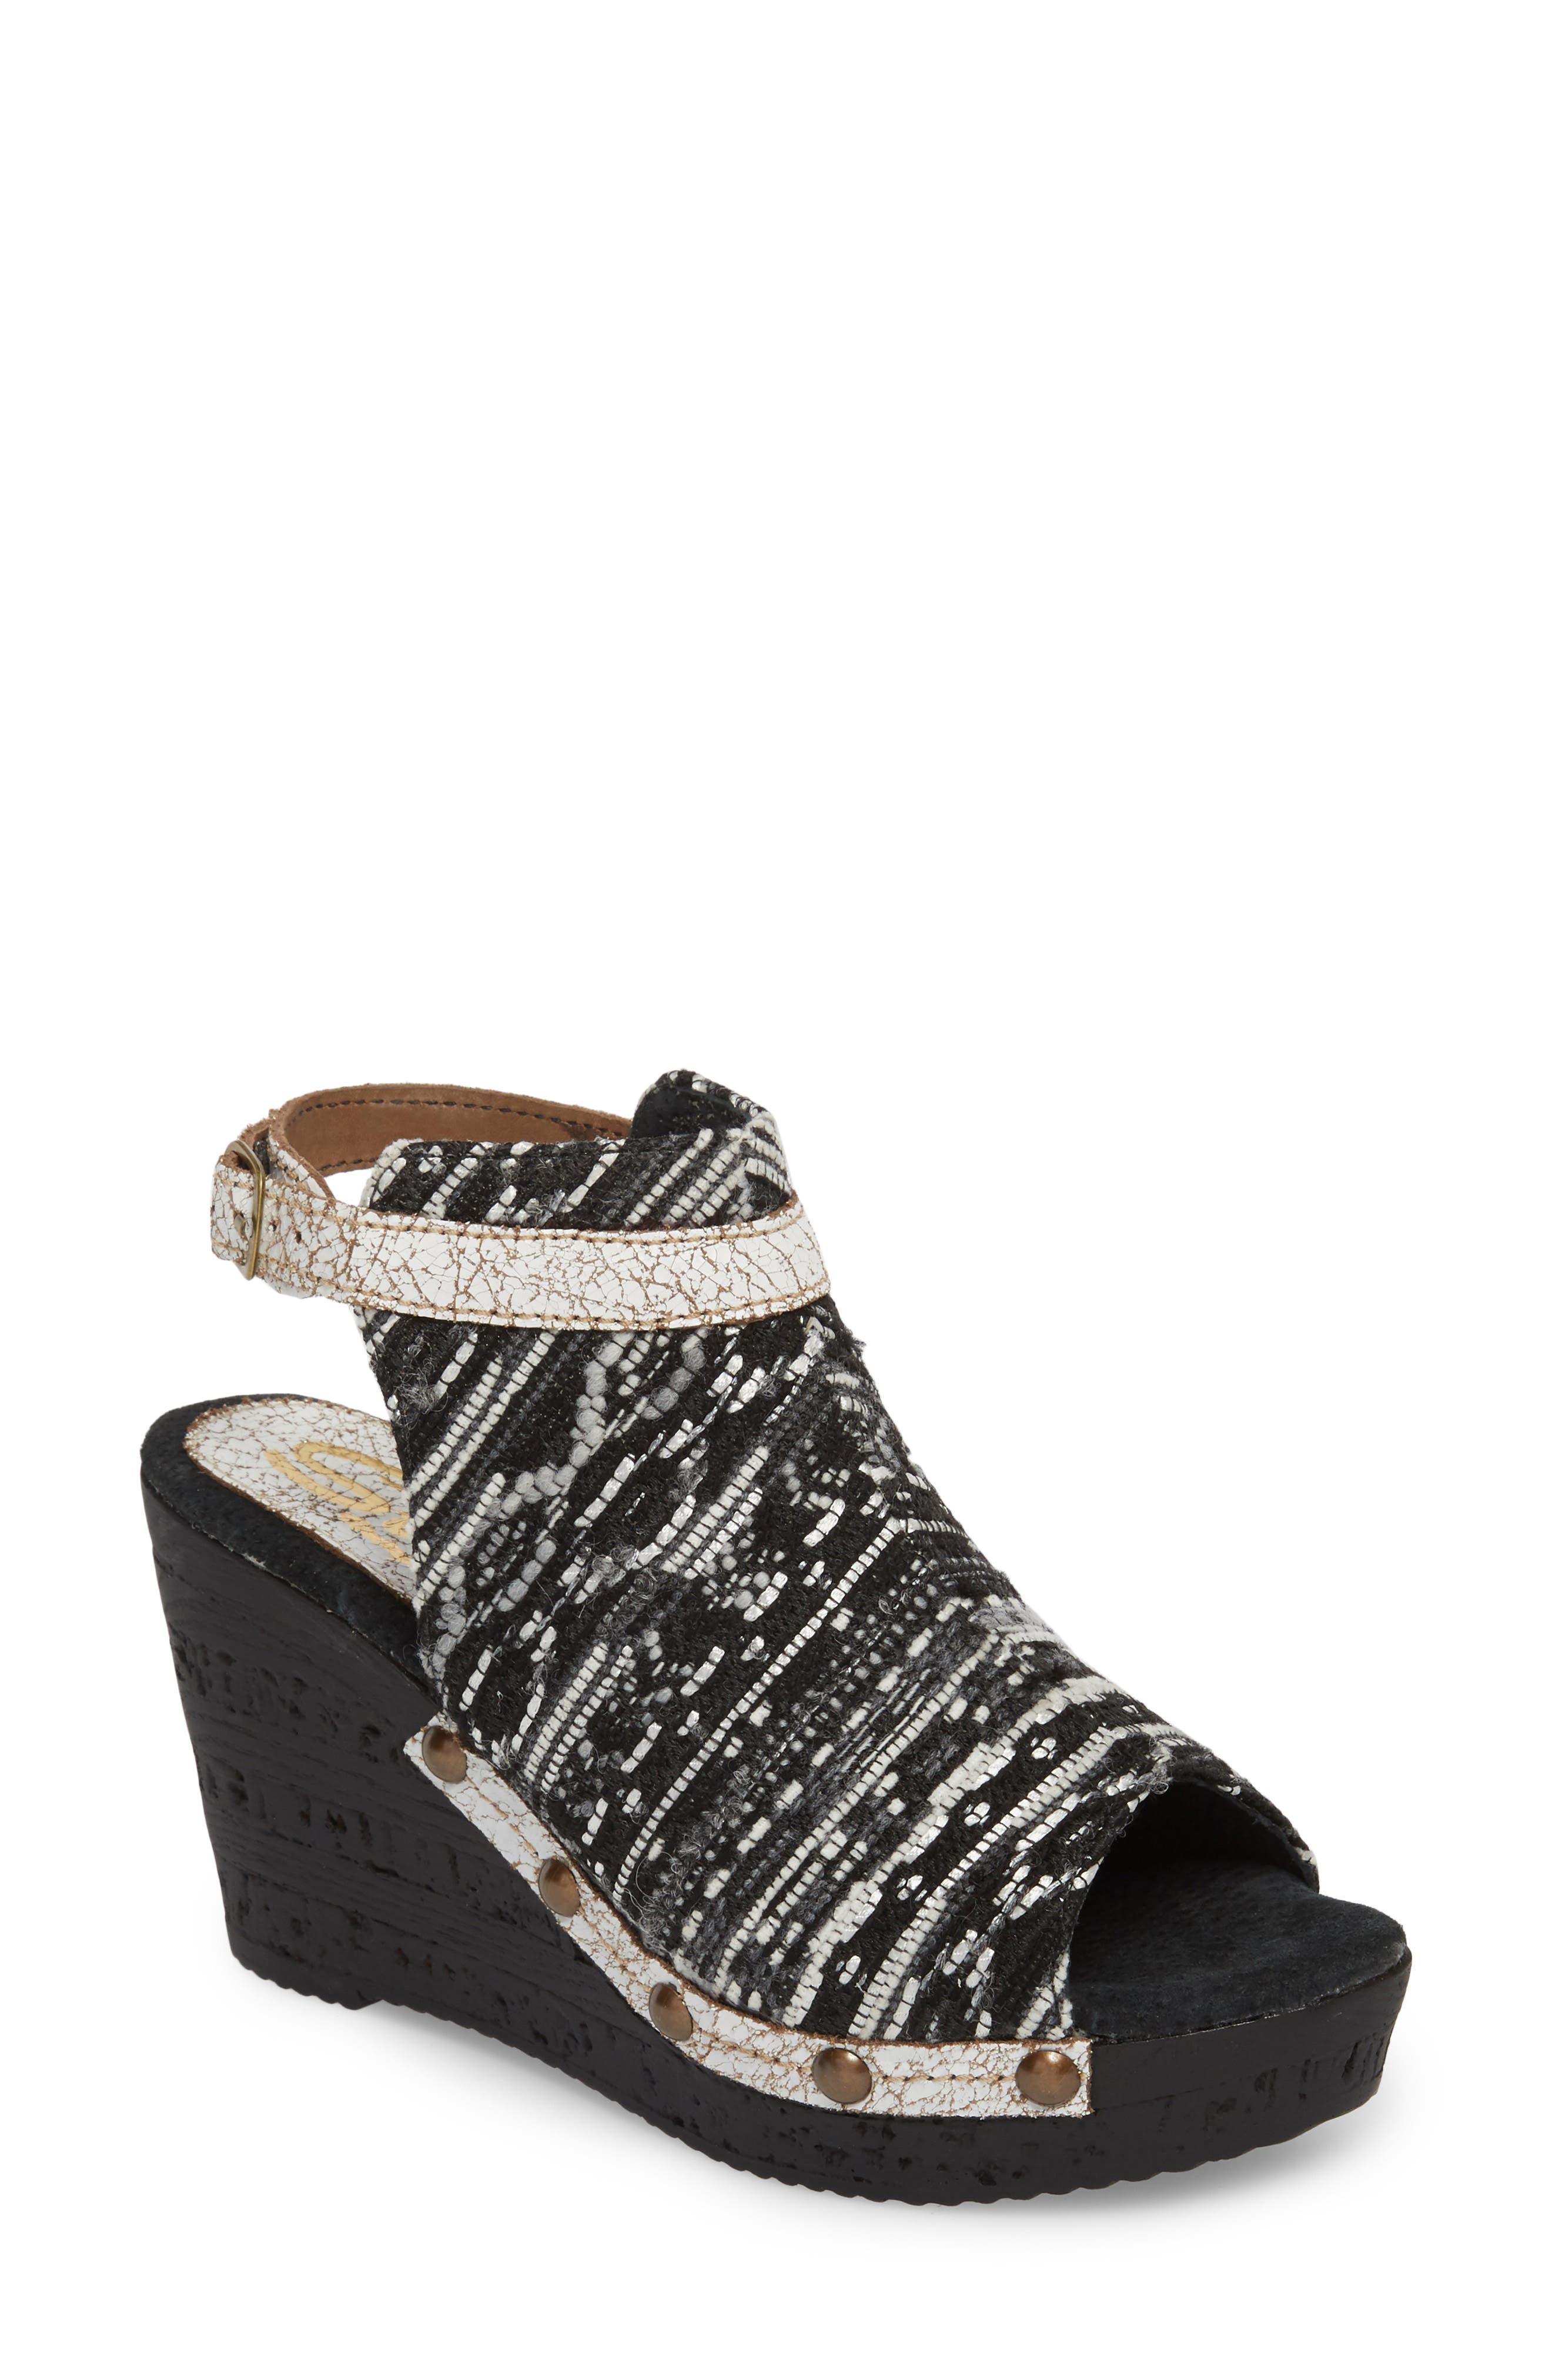 SBICCA,                             Sabari Peep Toe Wedge Sandal,                             Main thumbnail 1, color,                             001